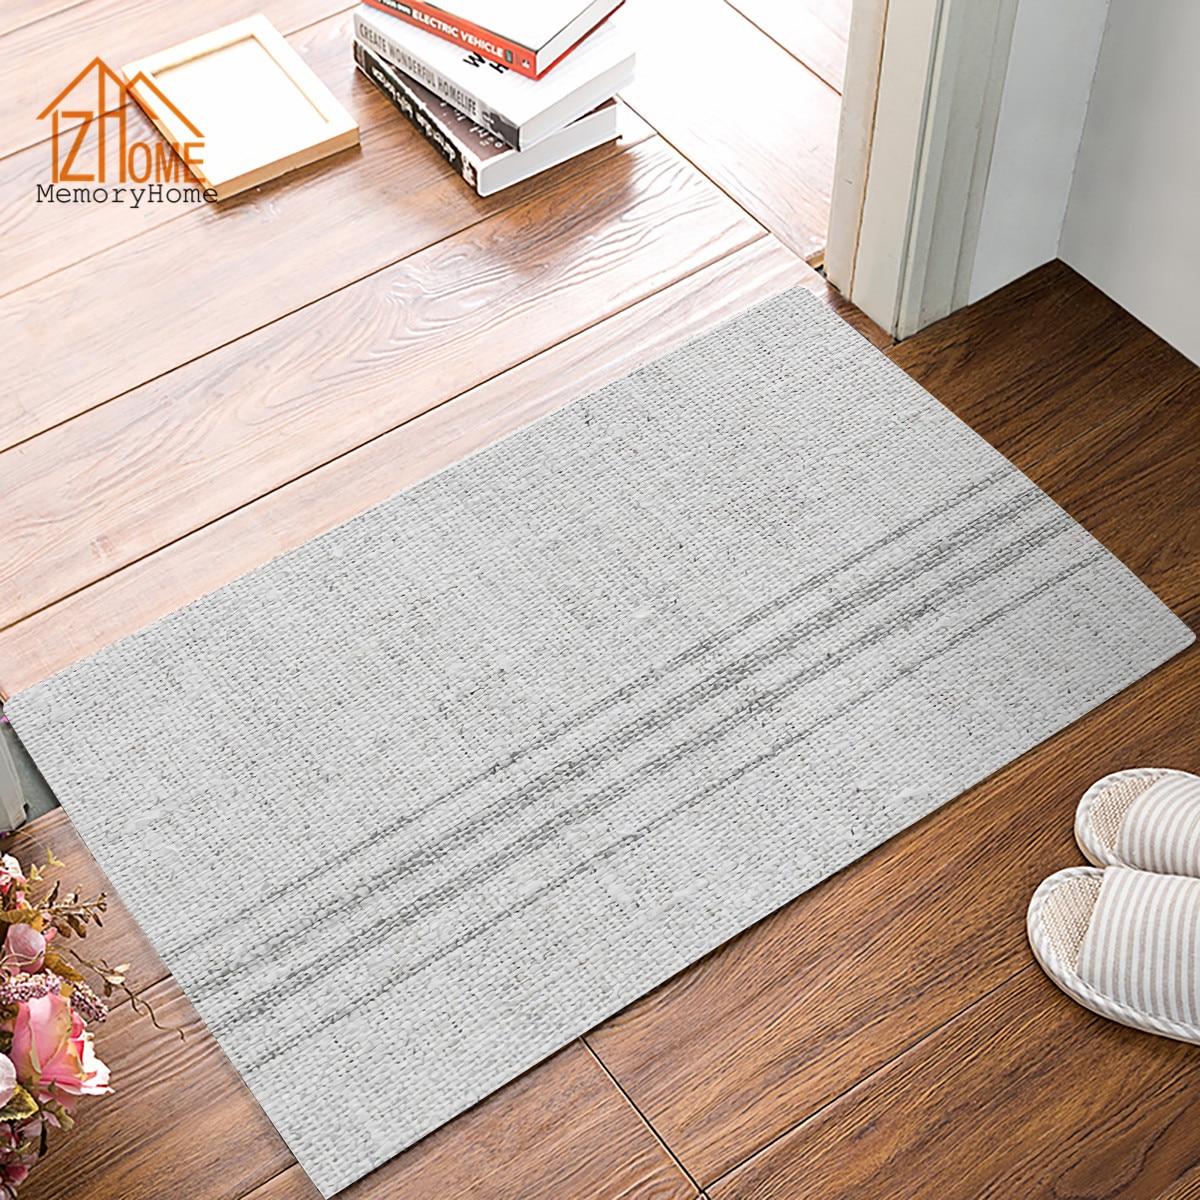 Memory Home Vintage Farmhouse Grain Sack Printed Doormat